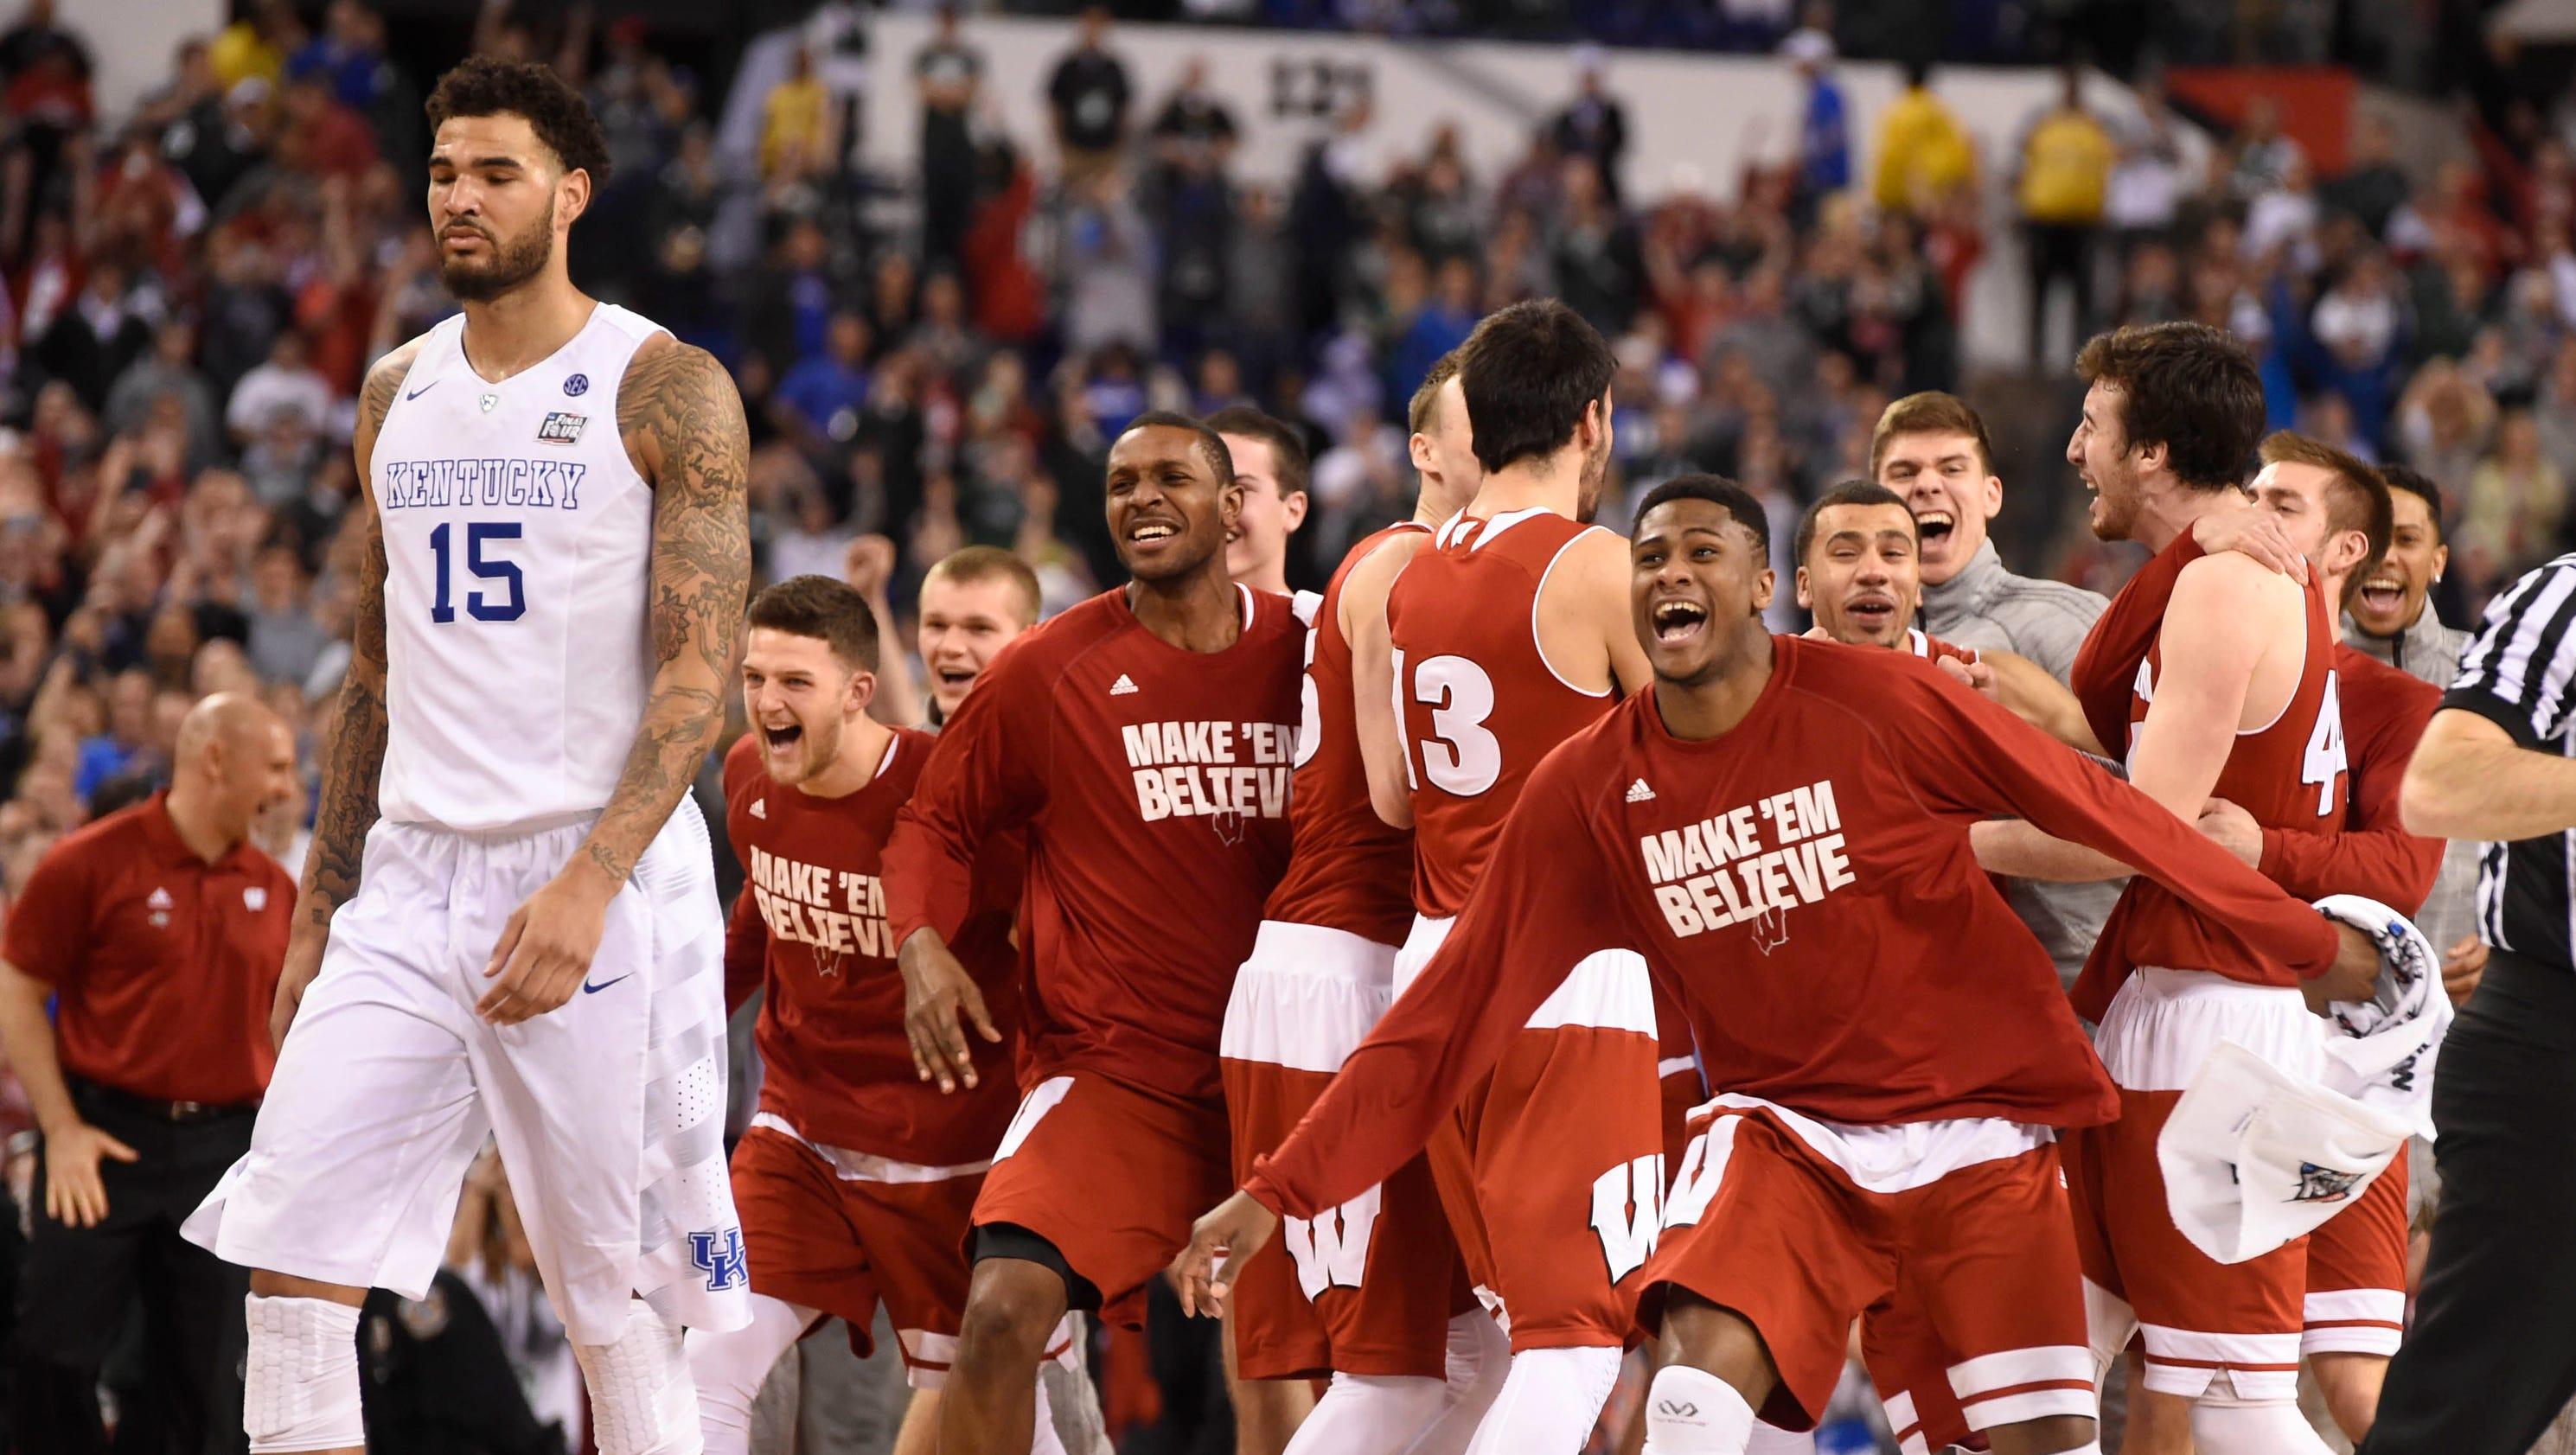 a history of basketball in america 2018-7-18 good morning america good morning  a basketball game at an la  history   @ballislife @overtime @houseofhighlights @nba @famouslos32 @.